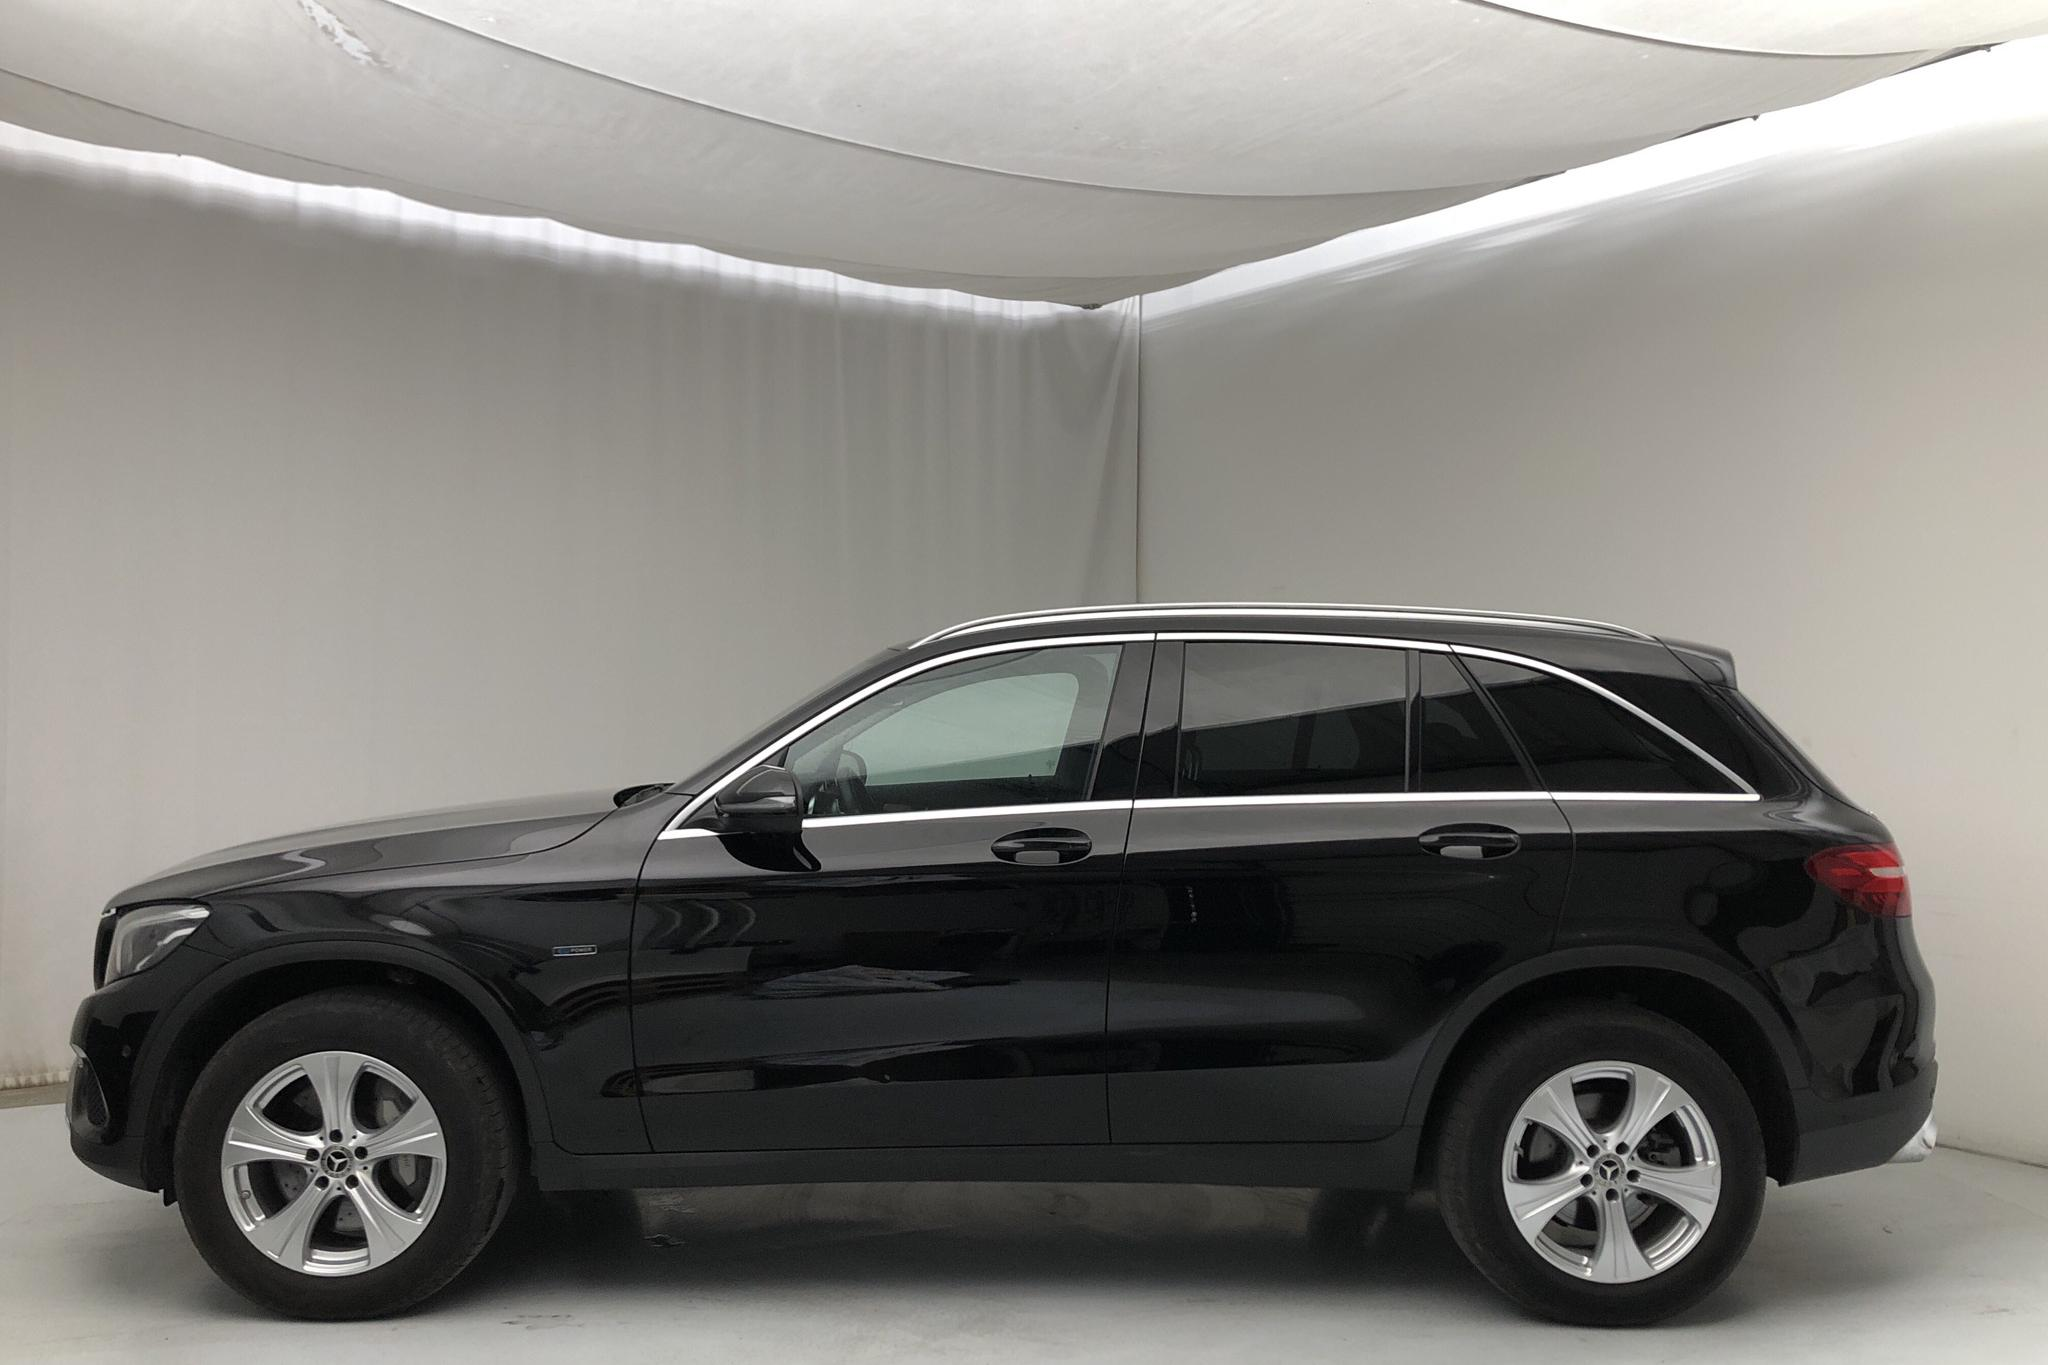 Mercedes GLC 350 e 4MATIC X253 (211hk) - 8 862 mil - Automat - svart - 2018